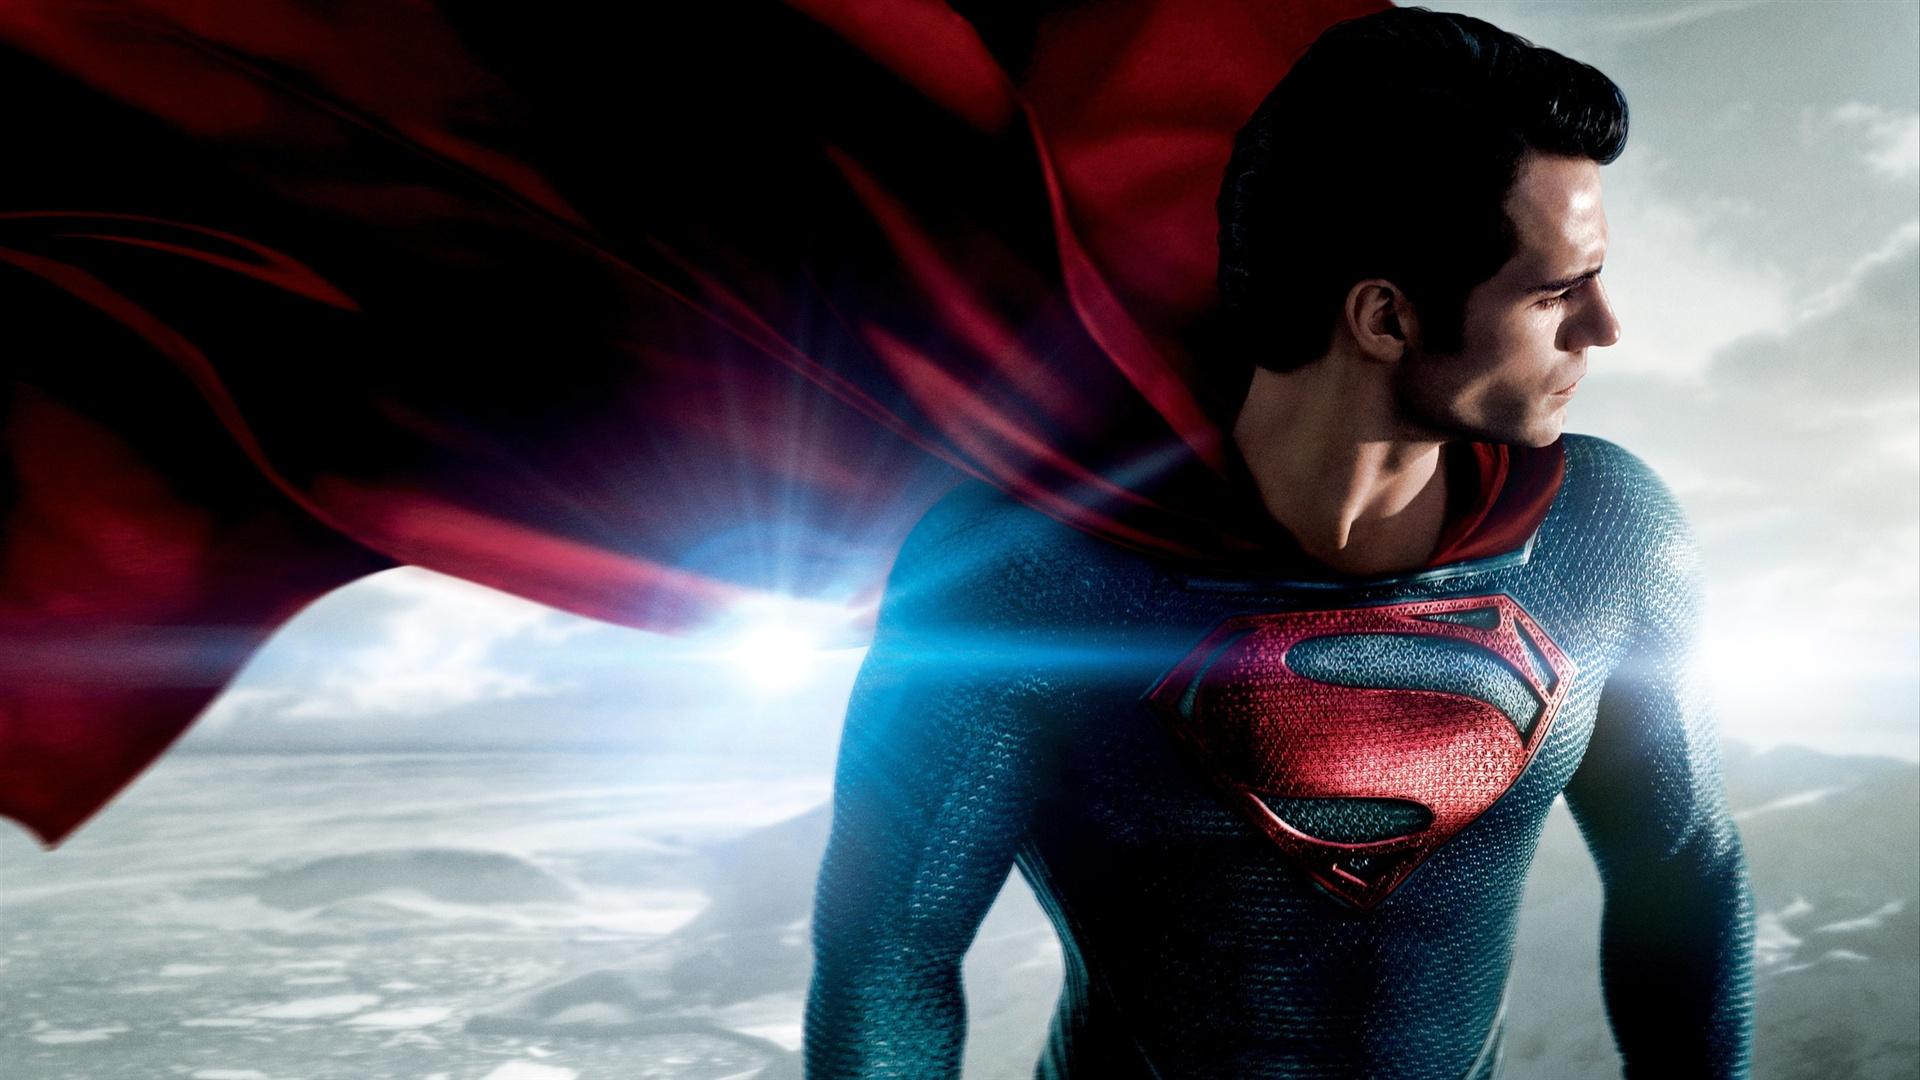 Wallpaper Man Of Steel Superhero 2560x1440 QHD Picture Image